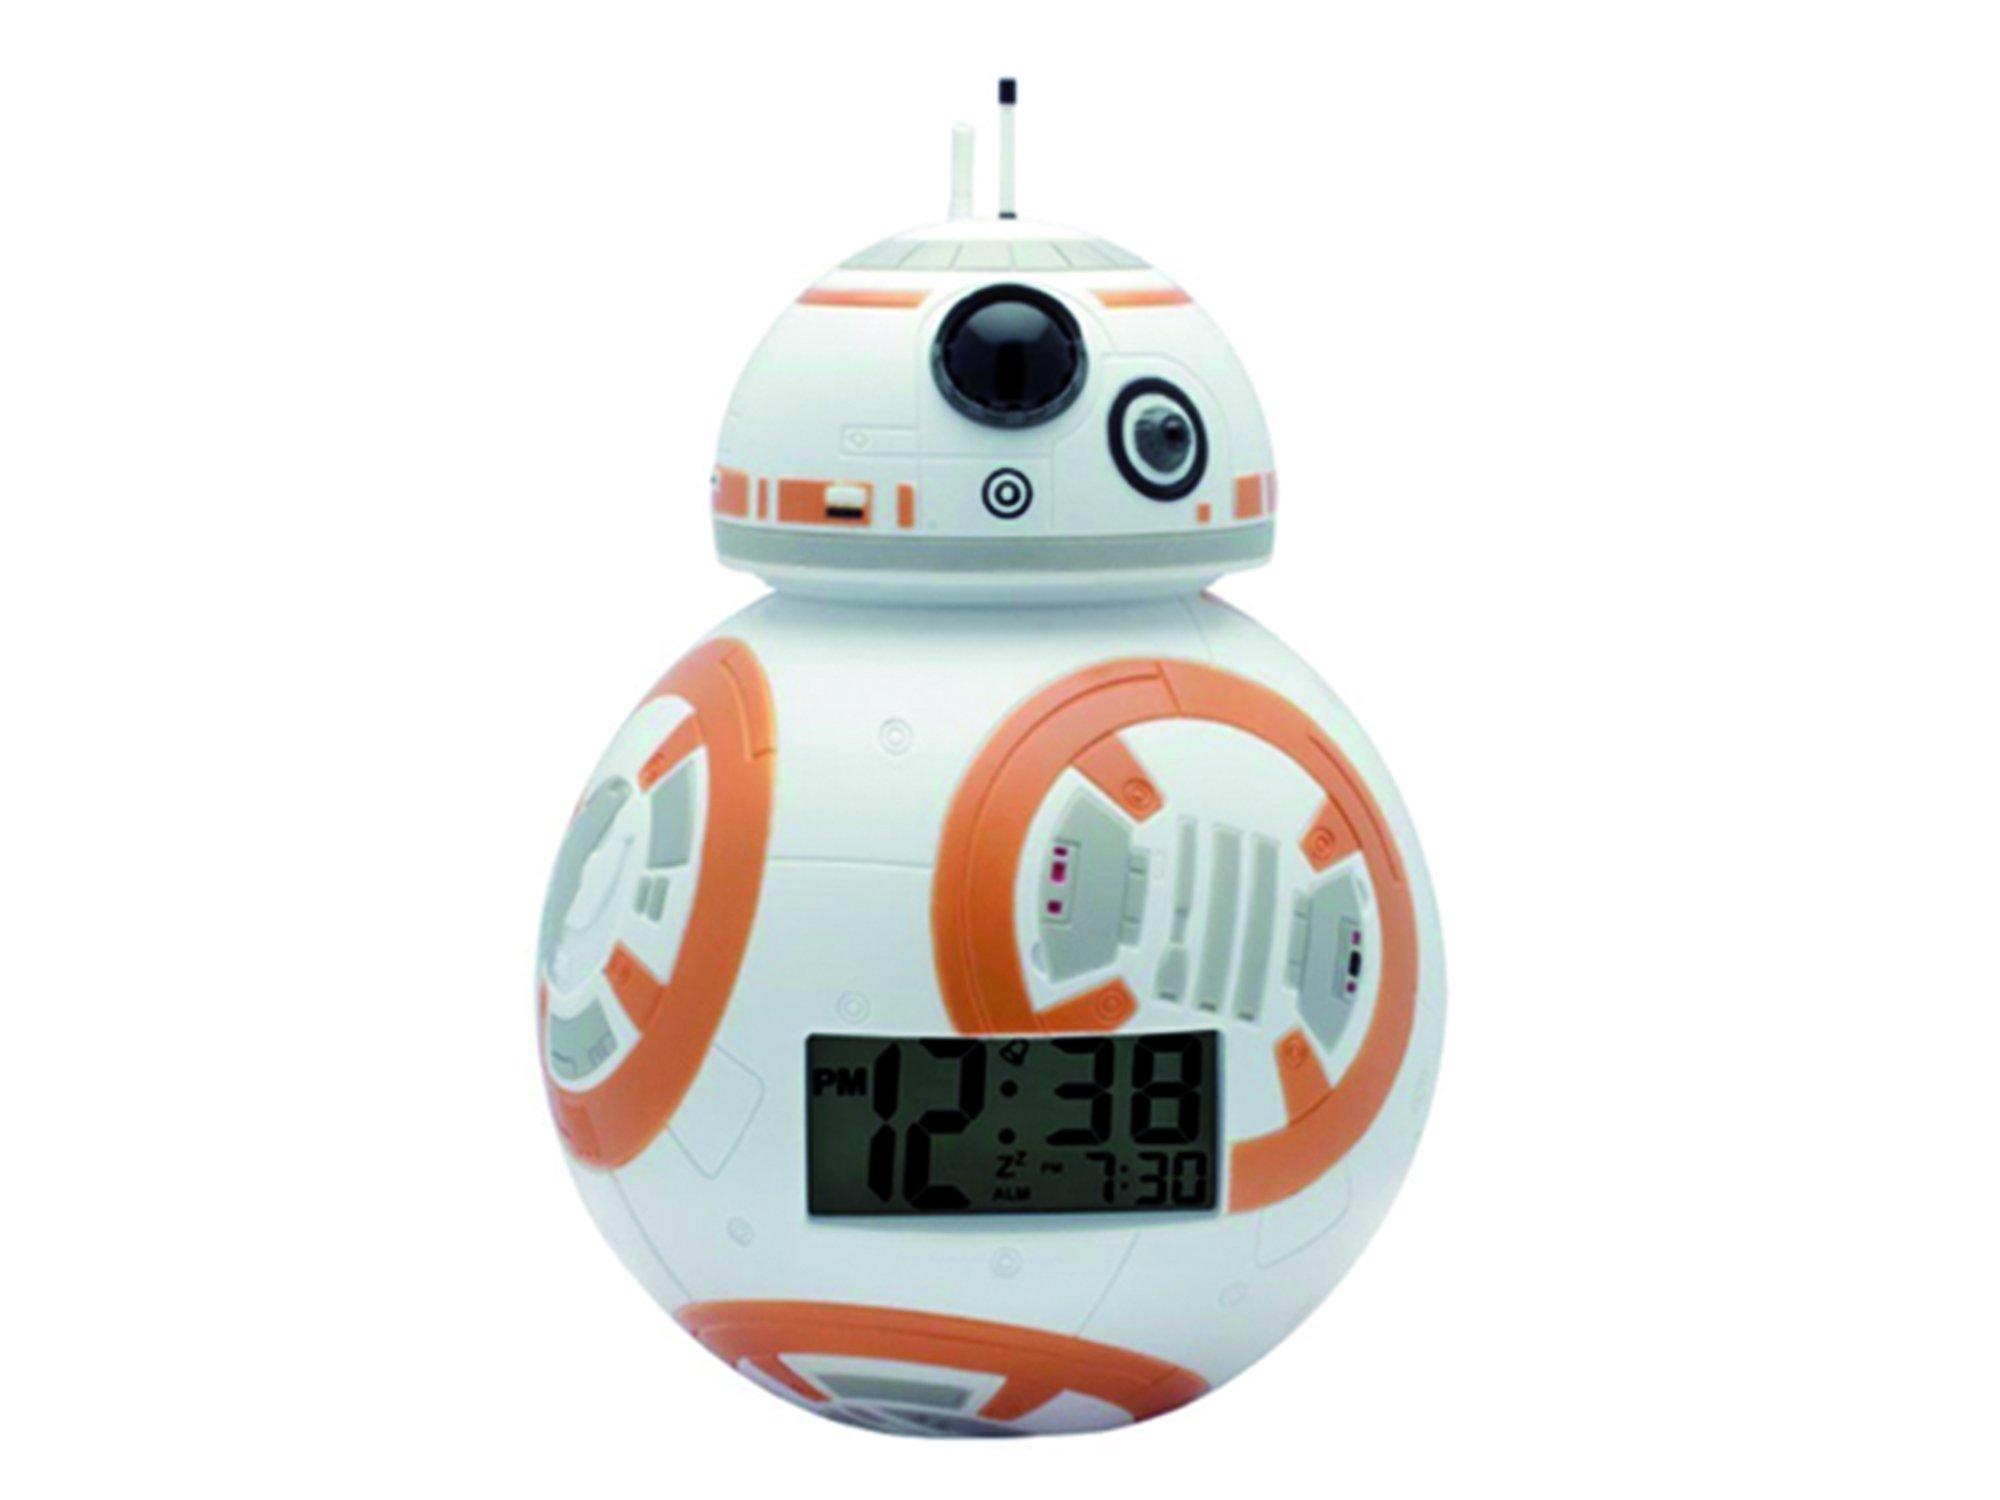 BulbBotz Star Wars BB-8 Kids Light up Alarm Clock   White/Orange   Plastic   3.5 inches Tall   LCD Display   boy Girl   Official